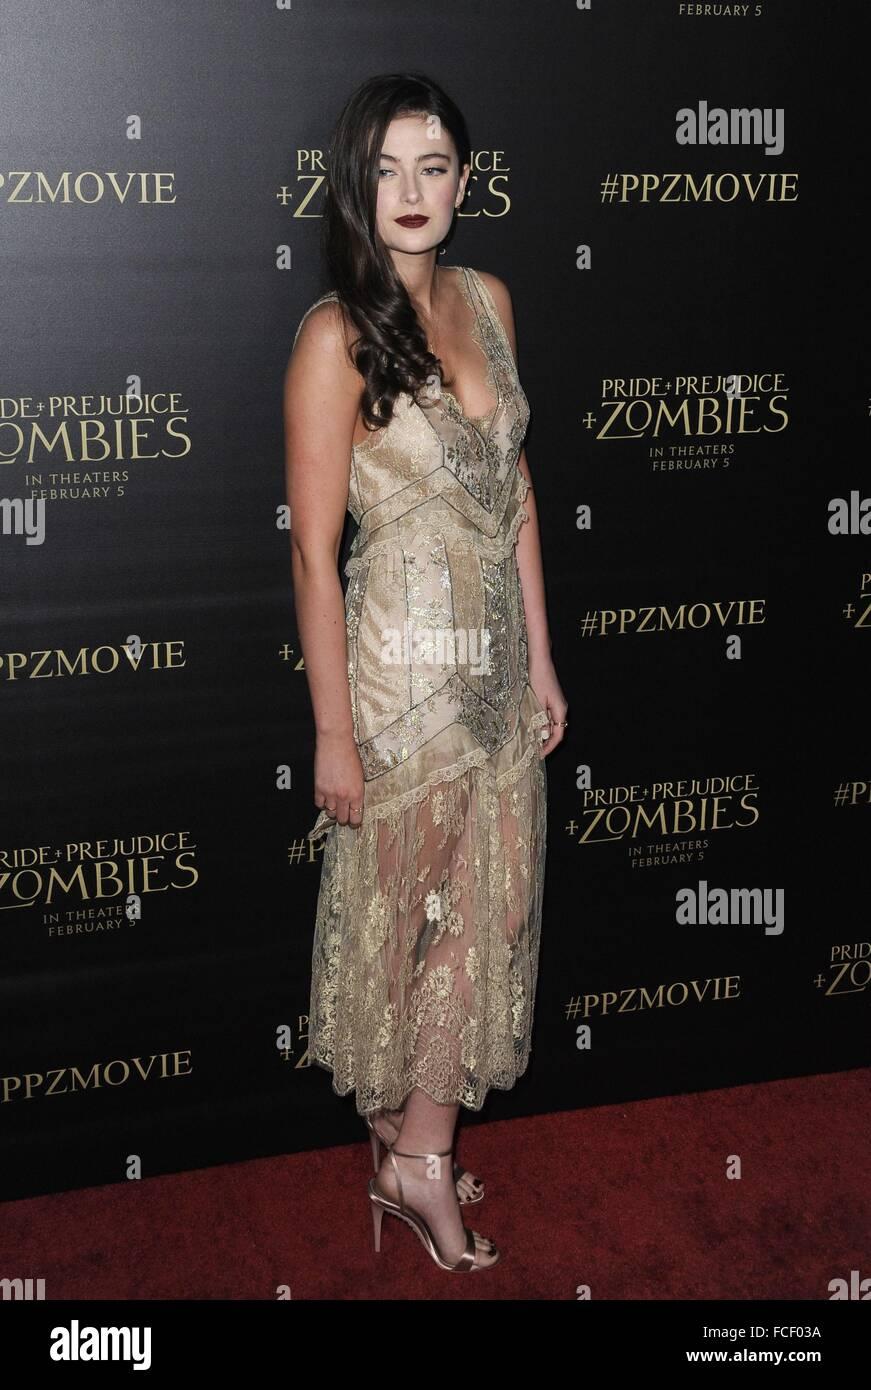 Exclusive: Actress Millie Brady Talks Red Carpet Prep